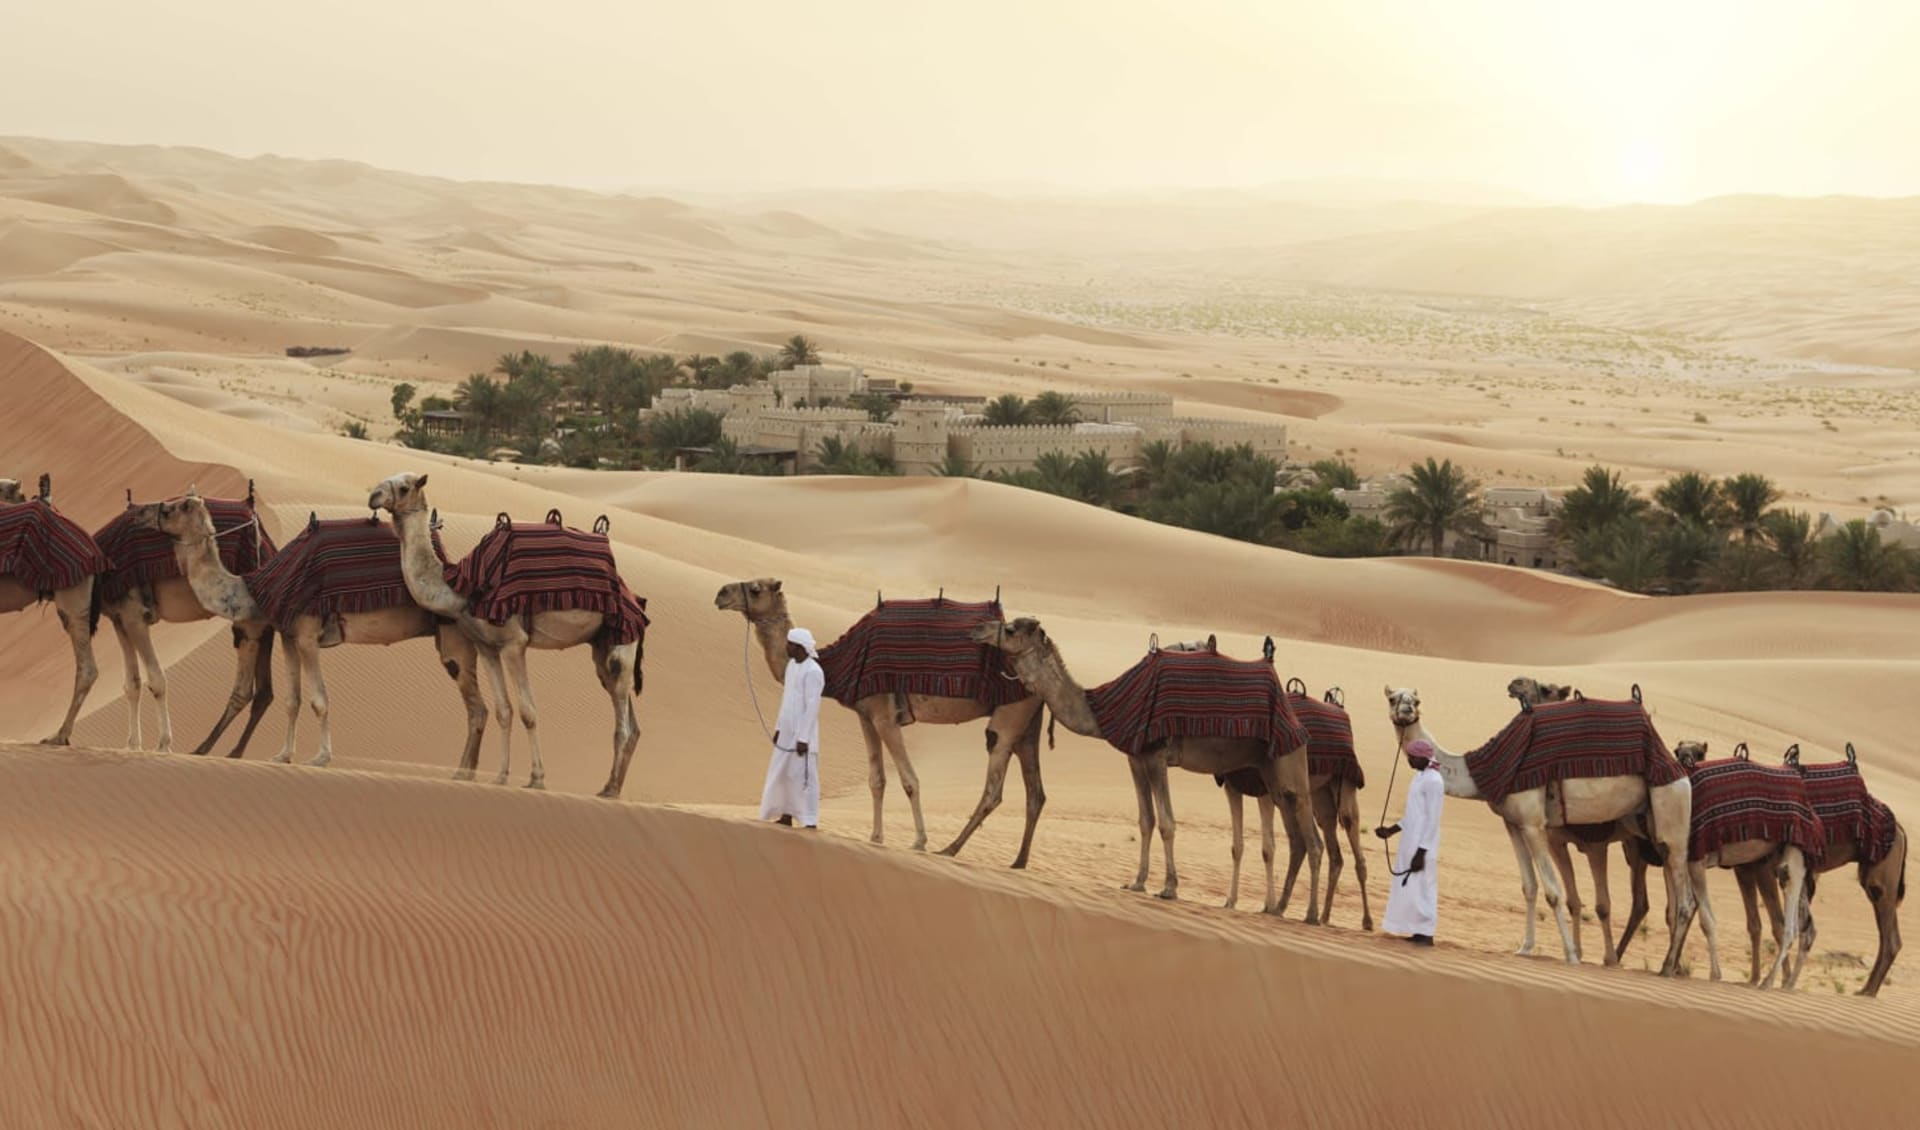 Anantara Qasr Al Sarab Desert Resort in Liwa: